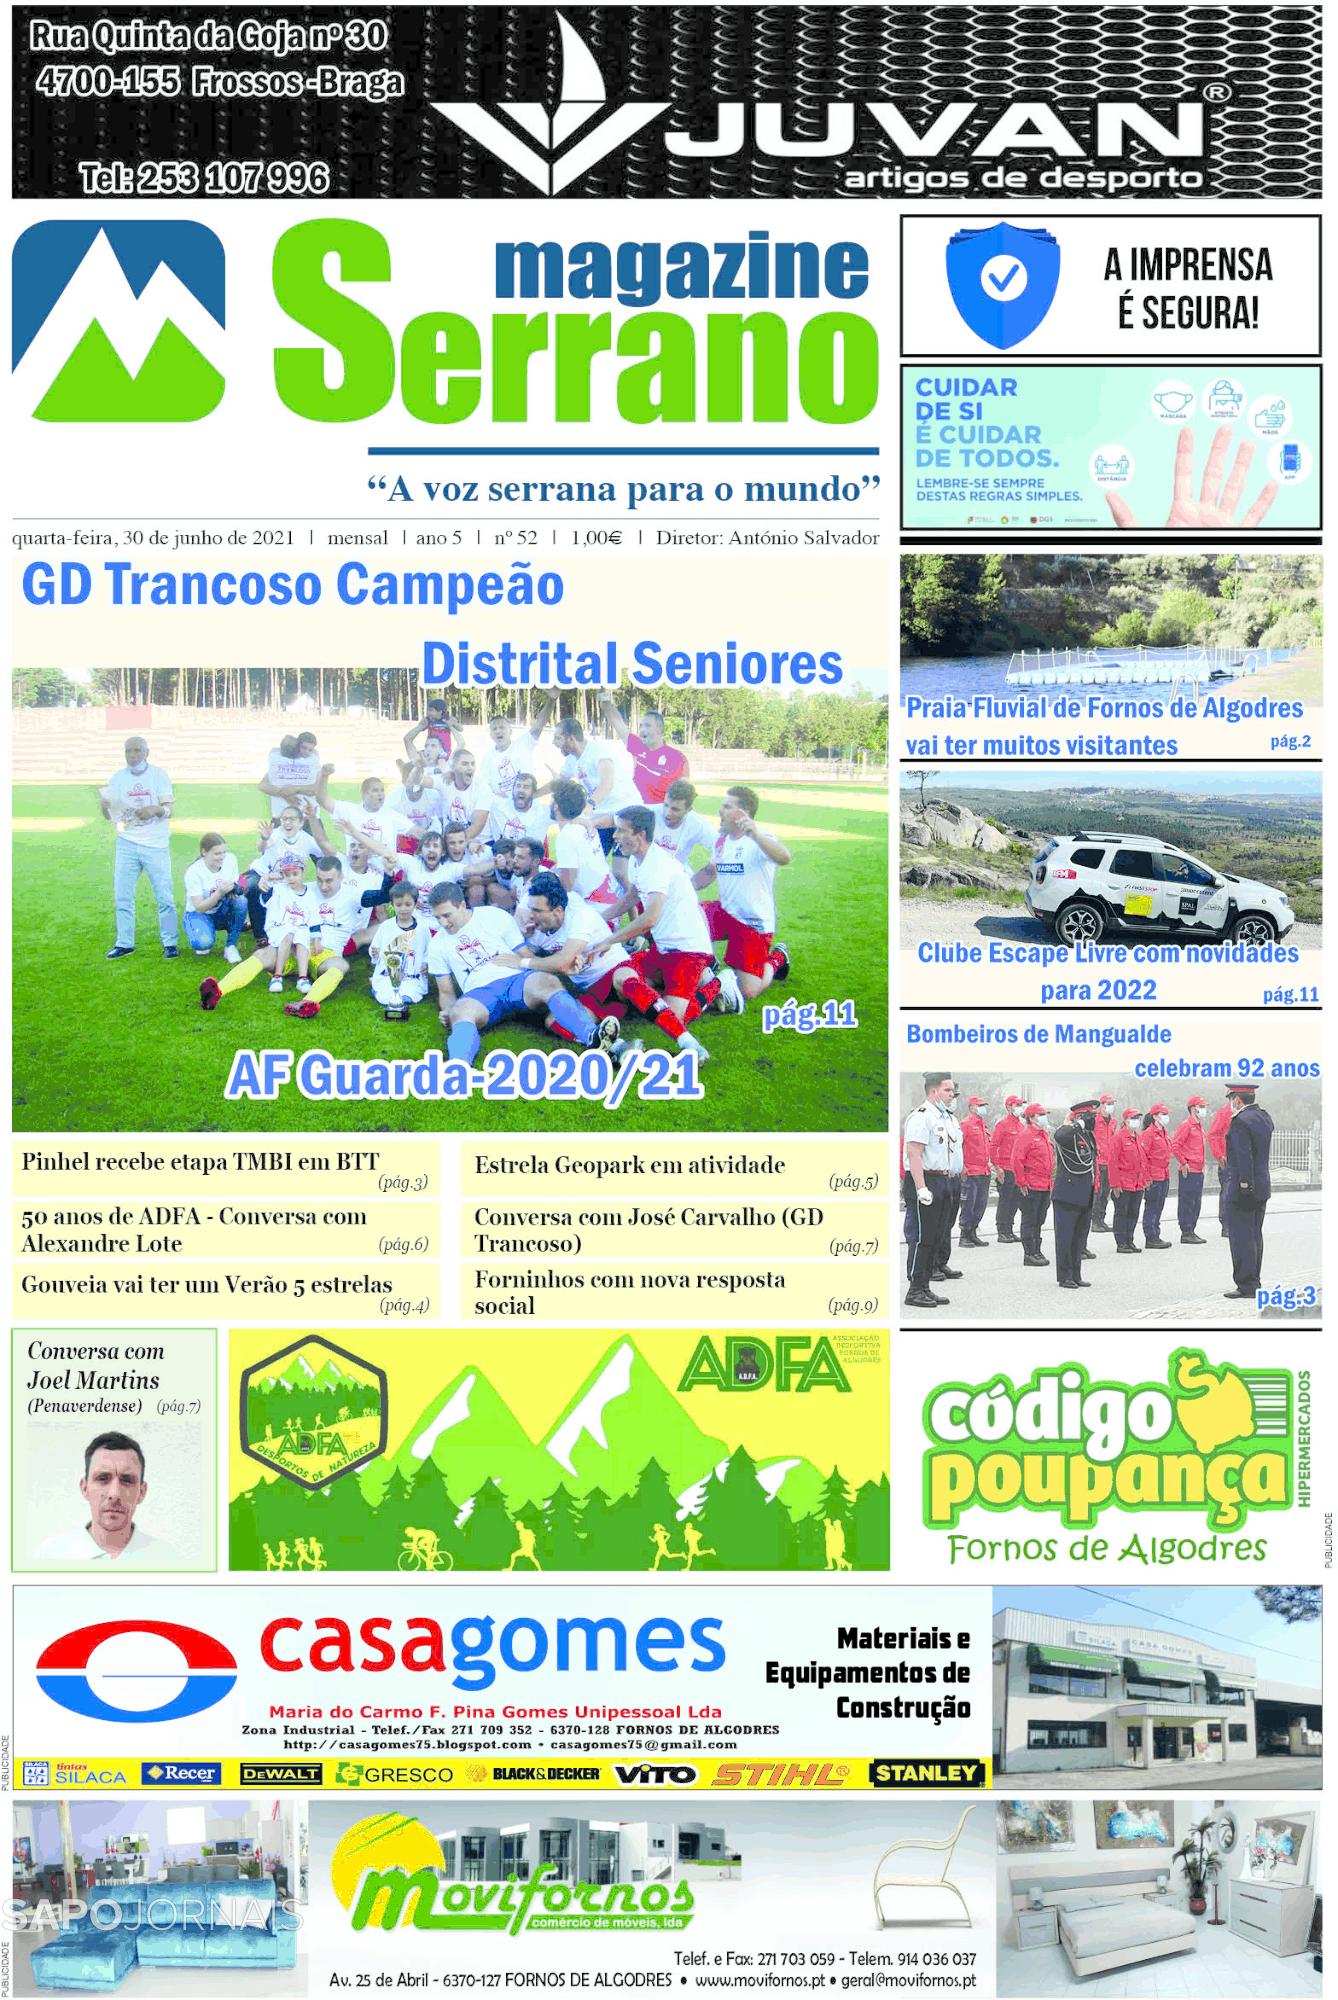 Magazine Serrano